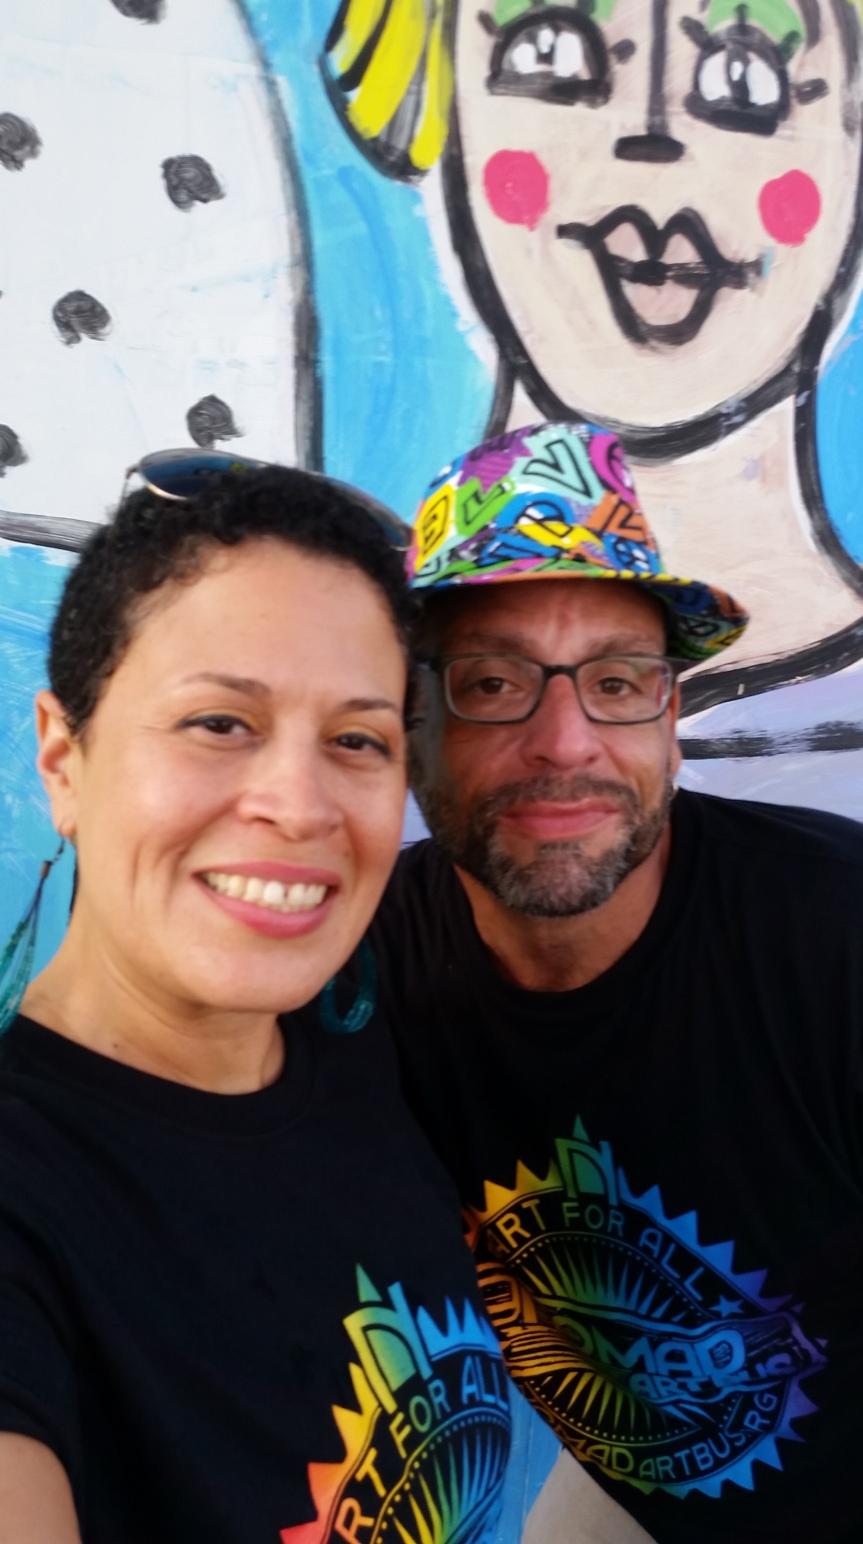 Pride 2016: Art ForAll